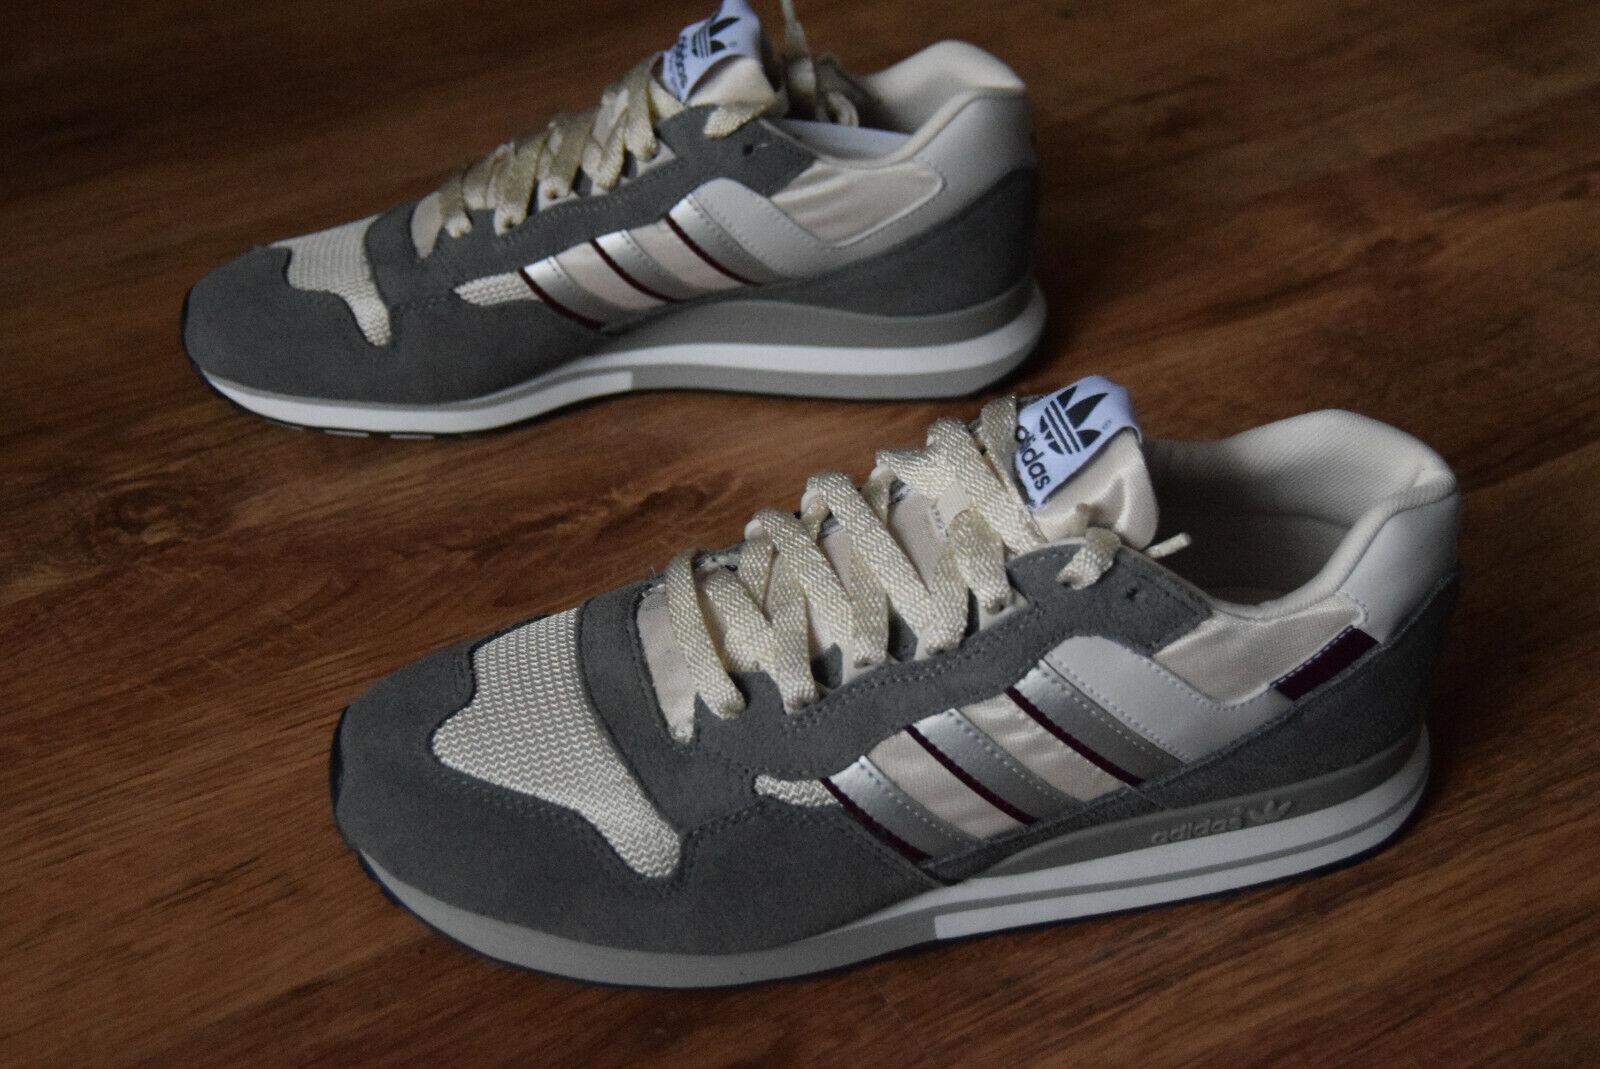 Adidas 530 SPZL 42 42,5 43 44 44,5 46,5 F35718 80's Spezial nEw yOrK sL 72 80